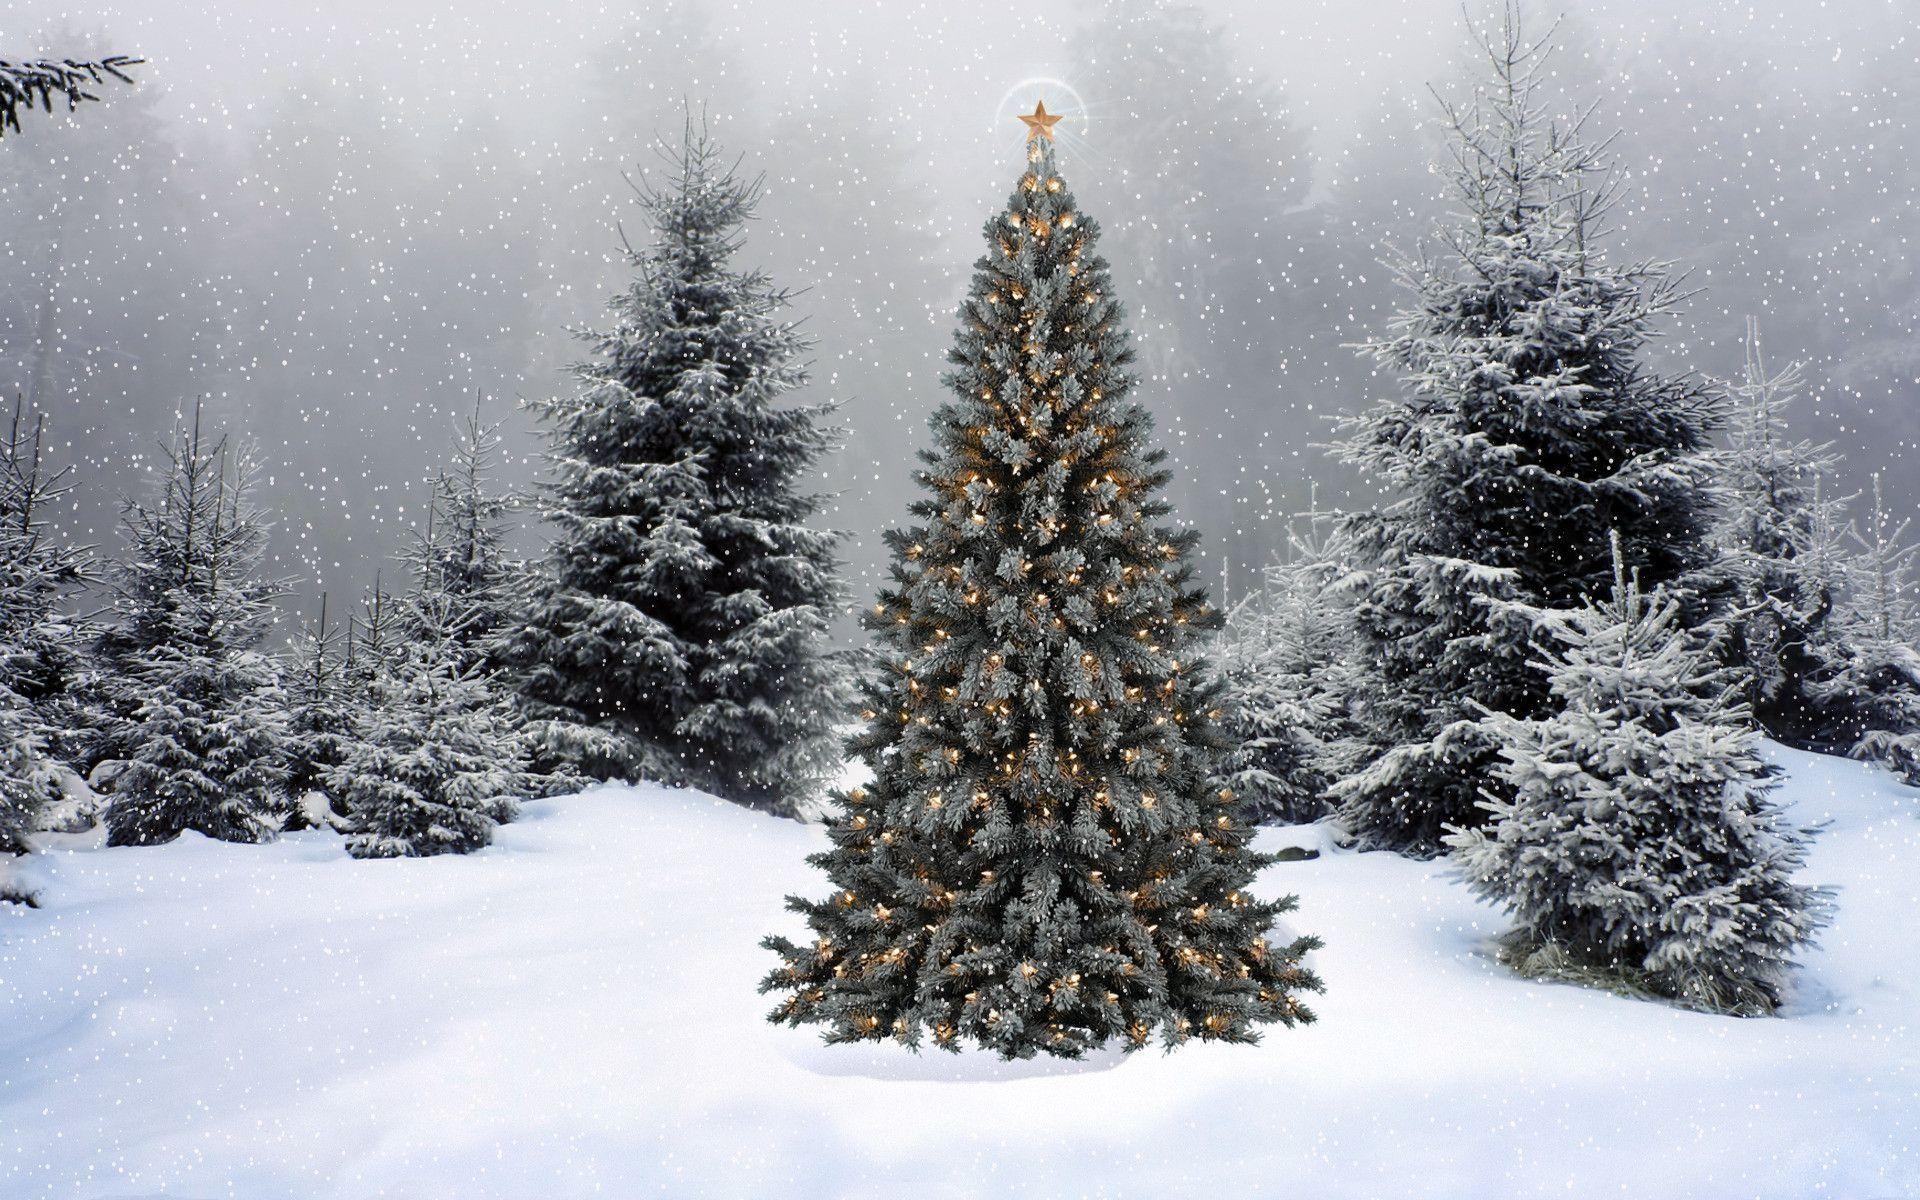 Christmas Scene Wallpapers – Full HD wallpaper search